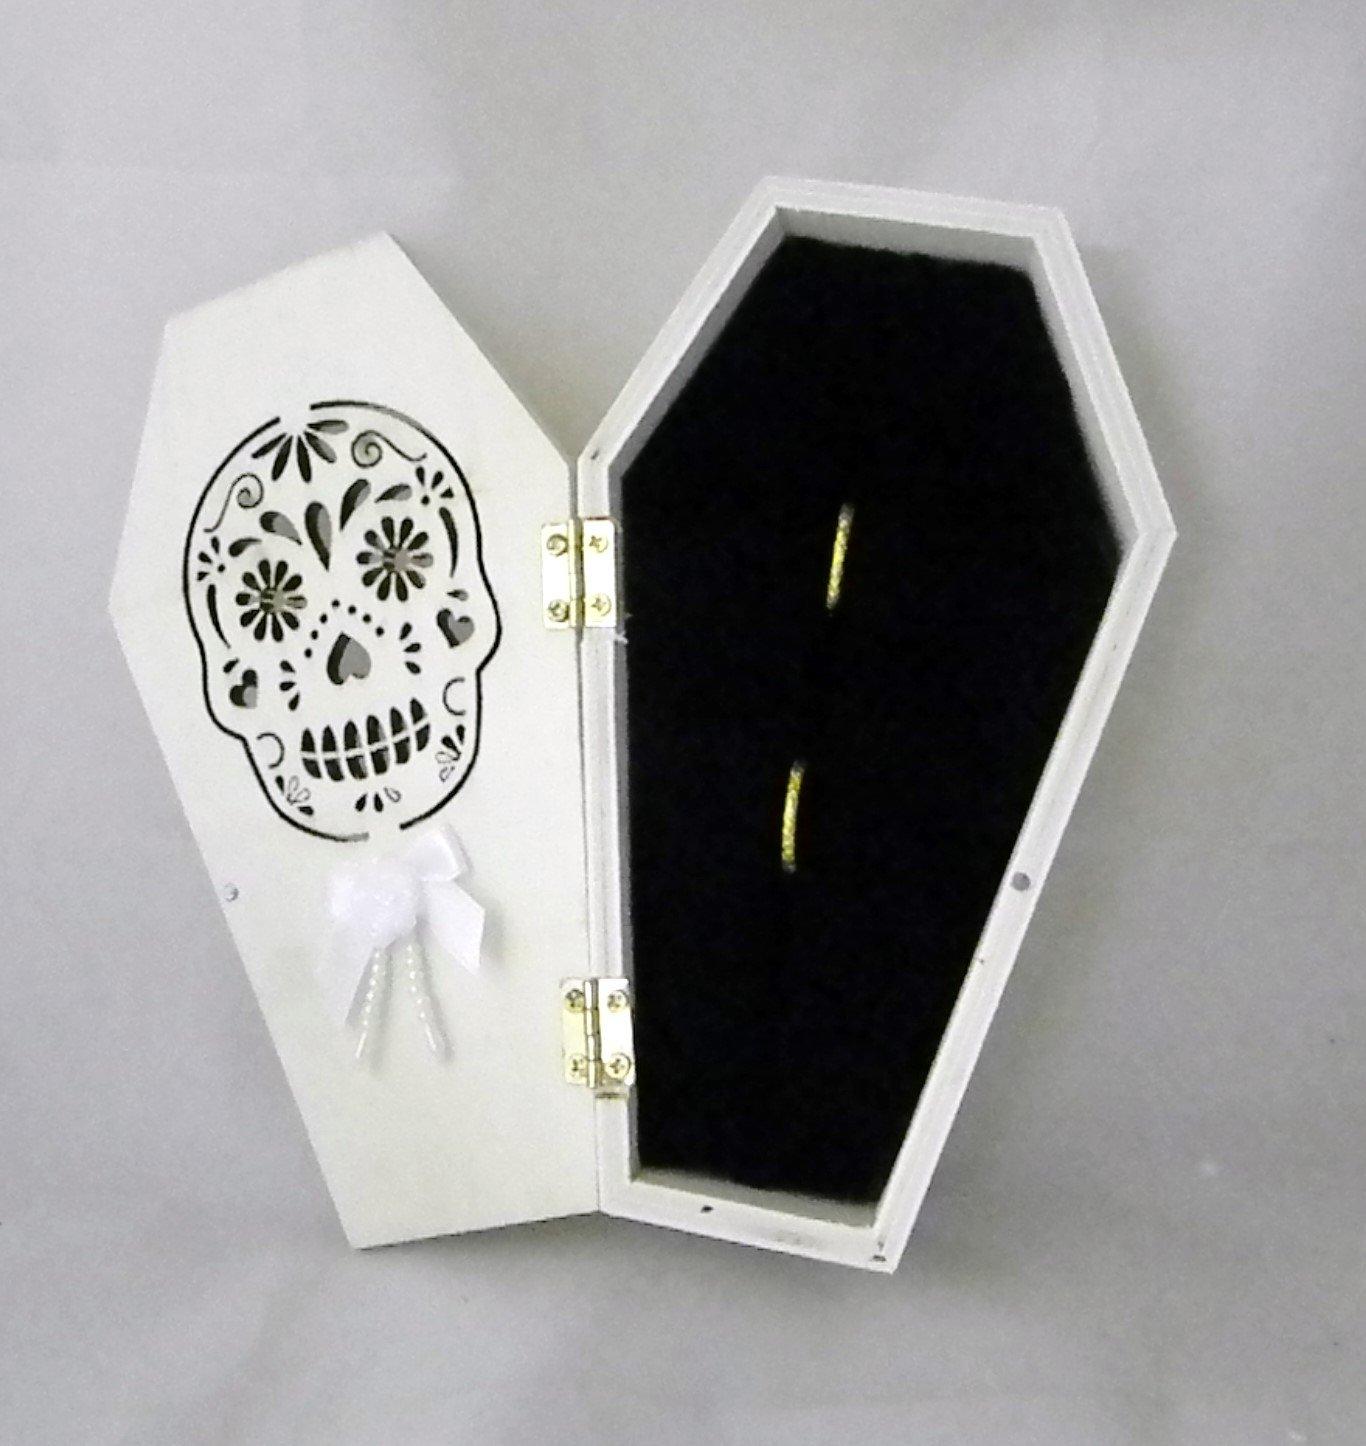 Wedding Ceremony Sugar Skull Gothic Coffin Tombstone ring bearer pillow Box